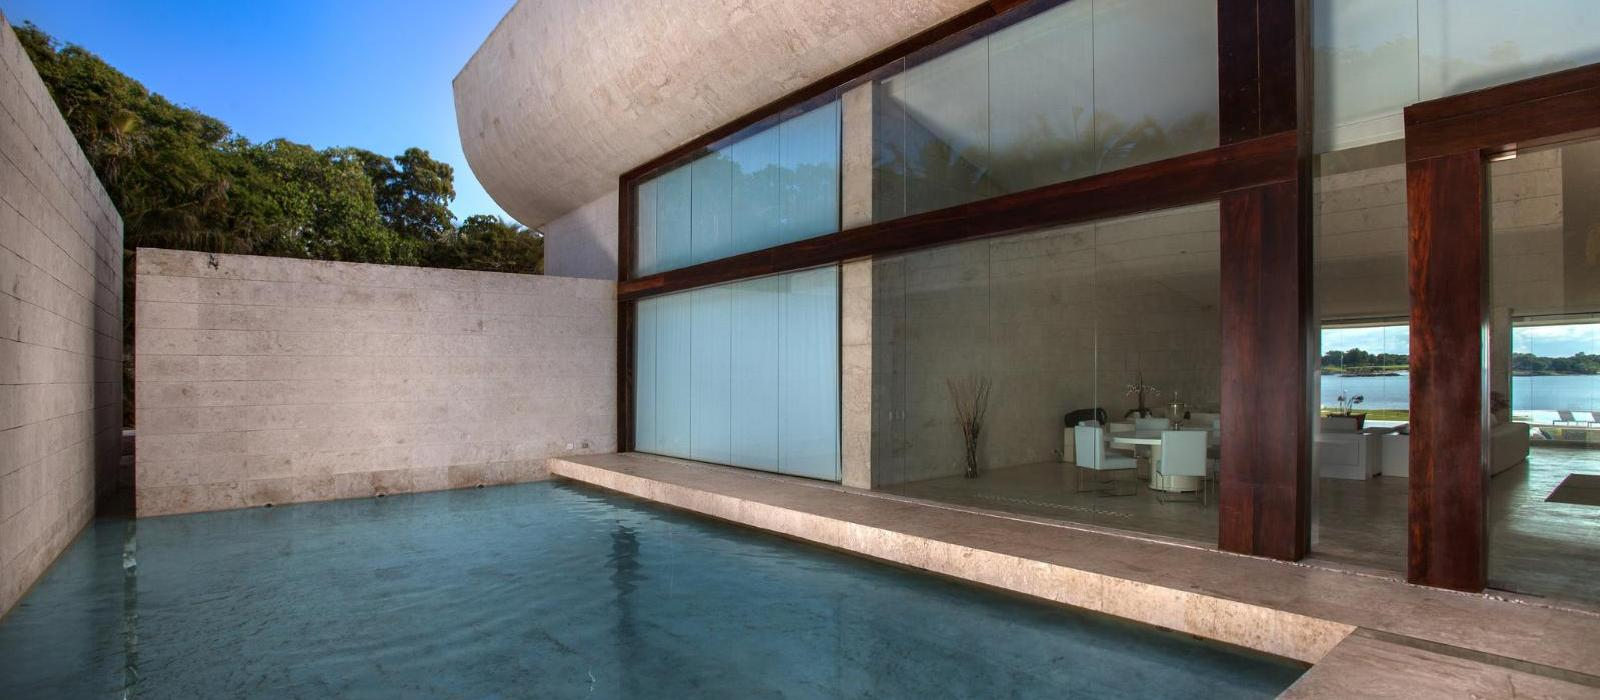 坎普庄园酒店(Casa de Campo Resort & Villas) 图片  www.lhw.cn